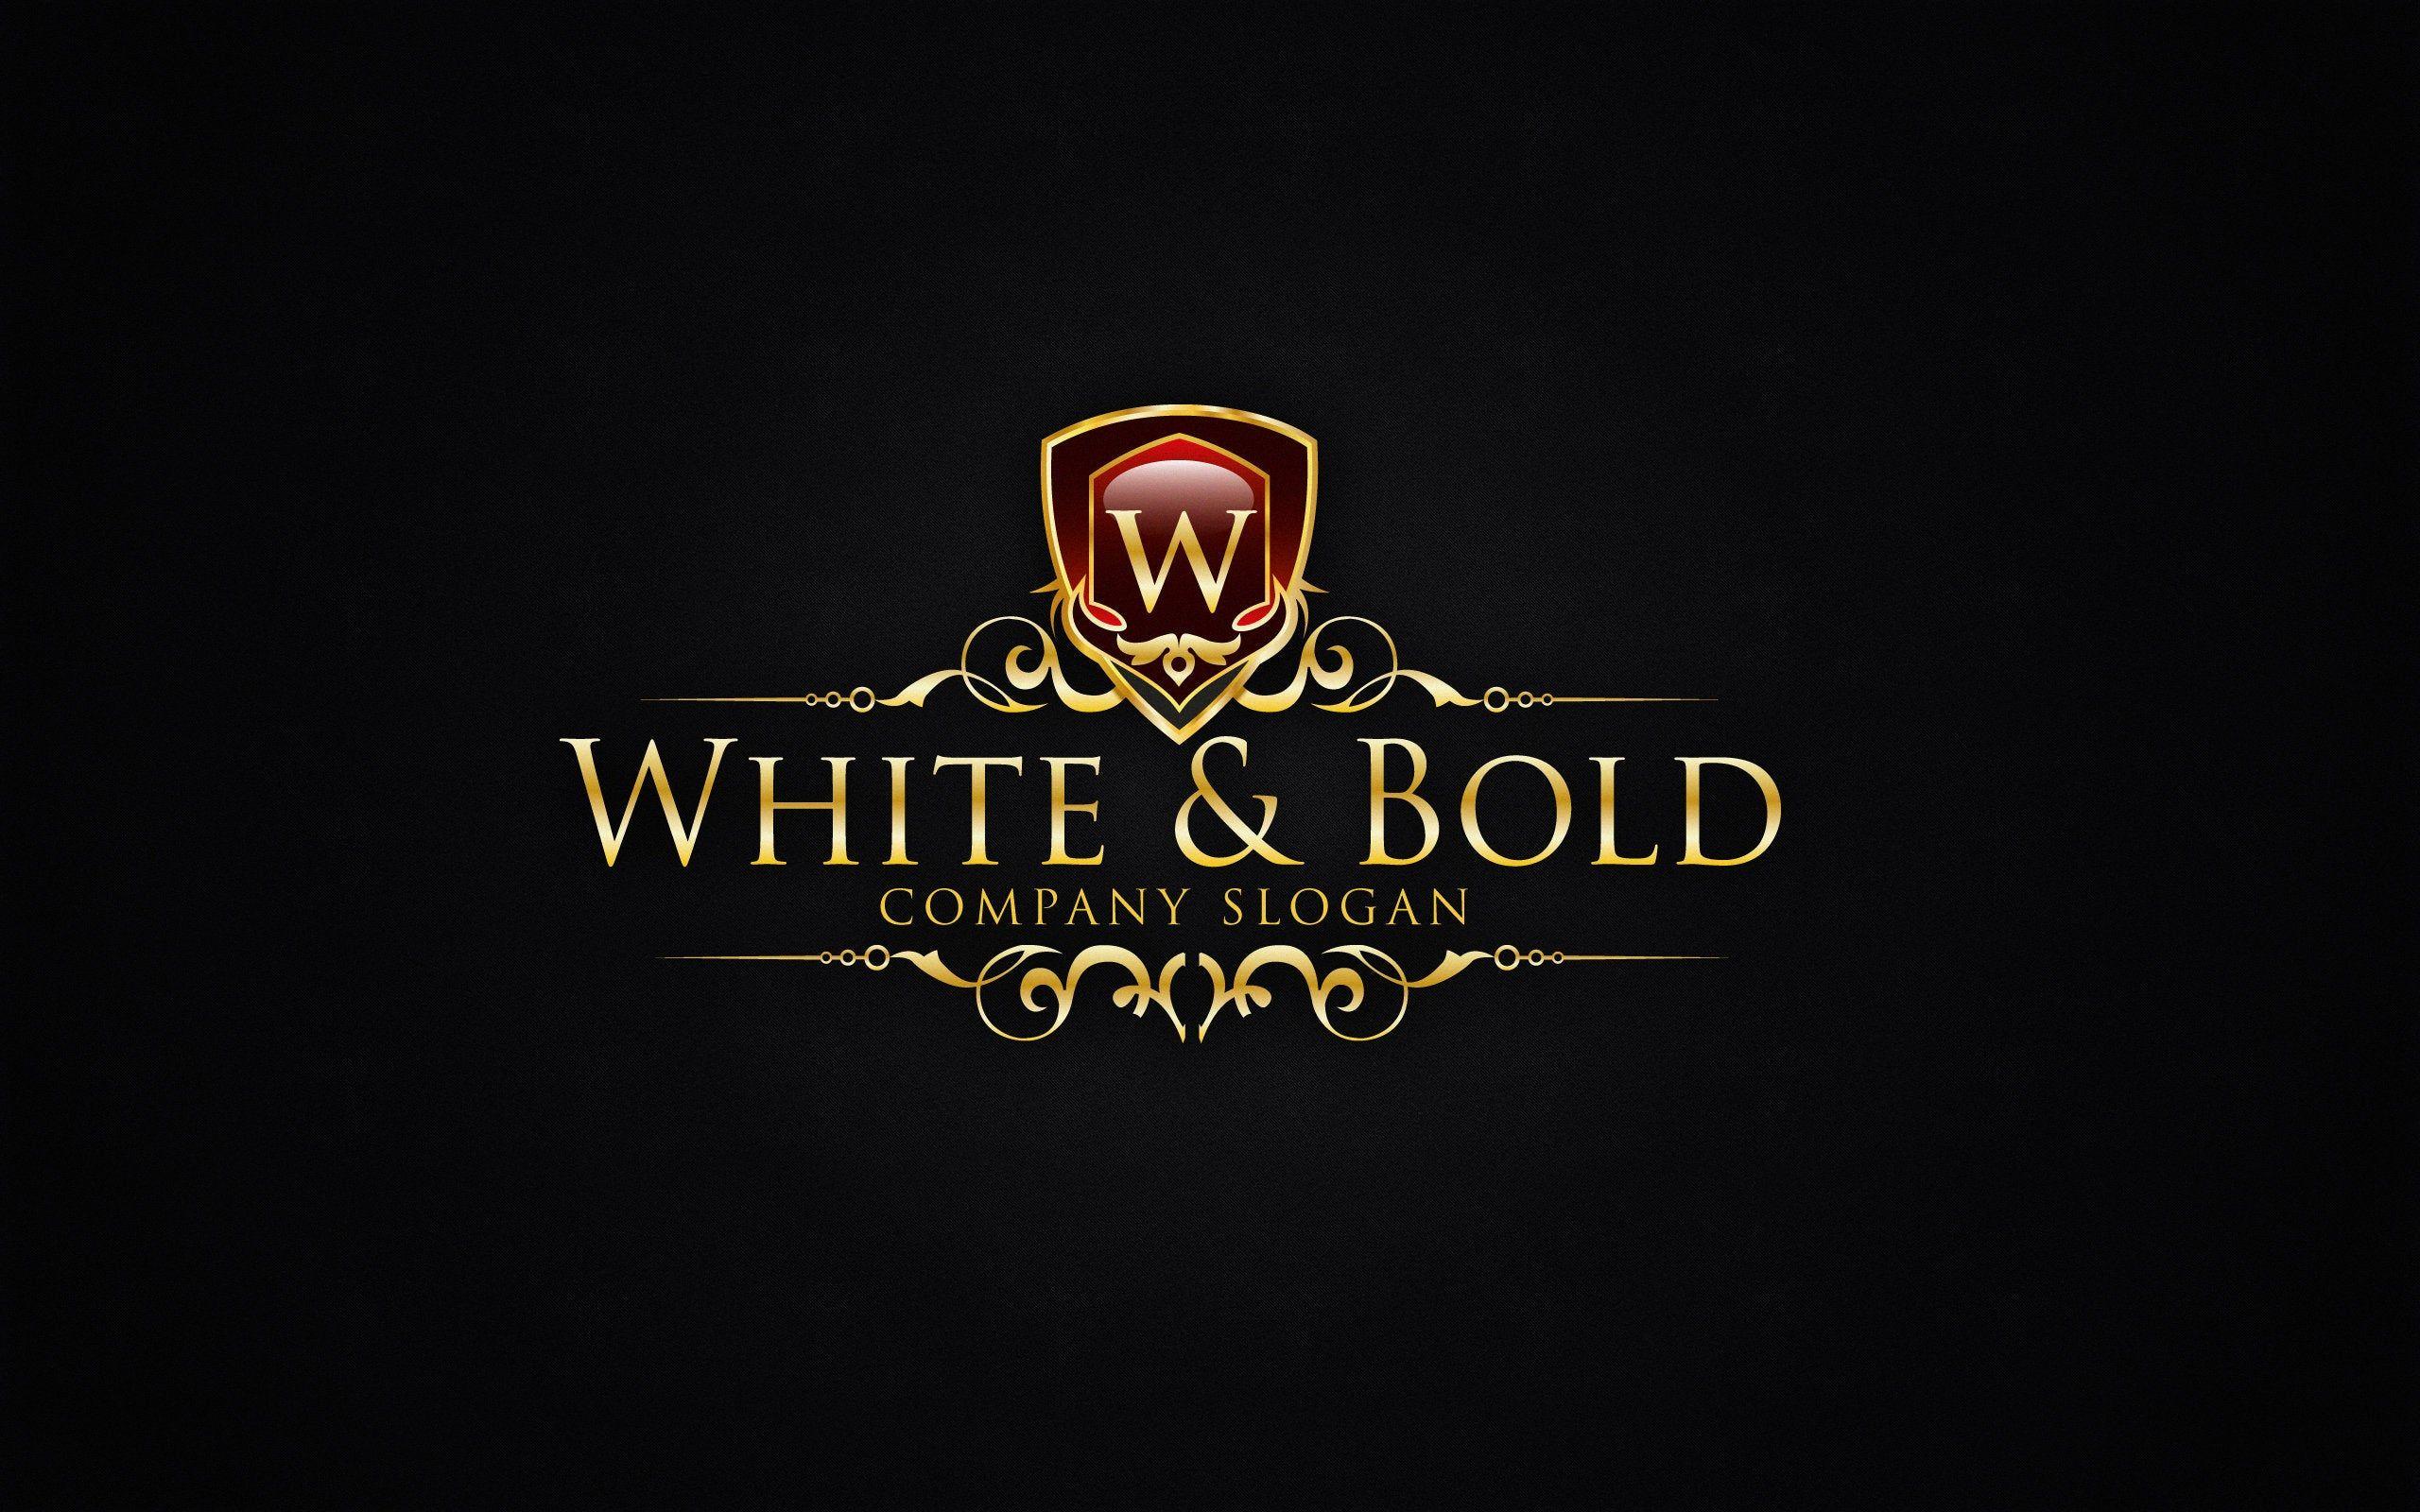 Vintage gold logos Elegant emblem monogram luxury logo